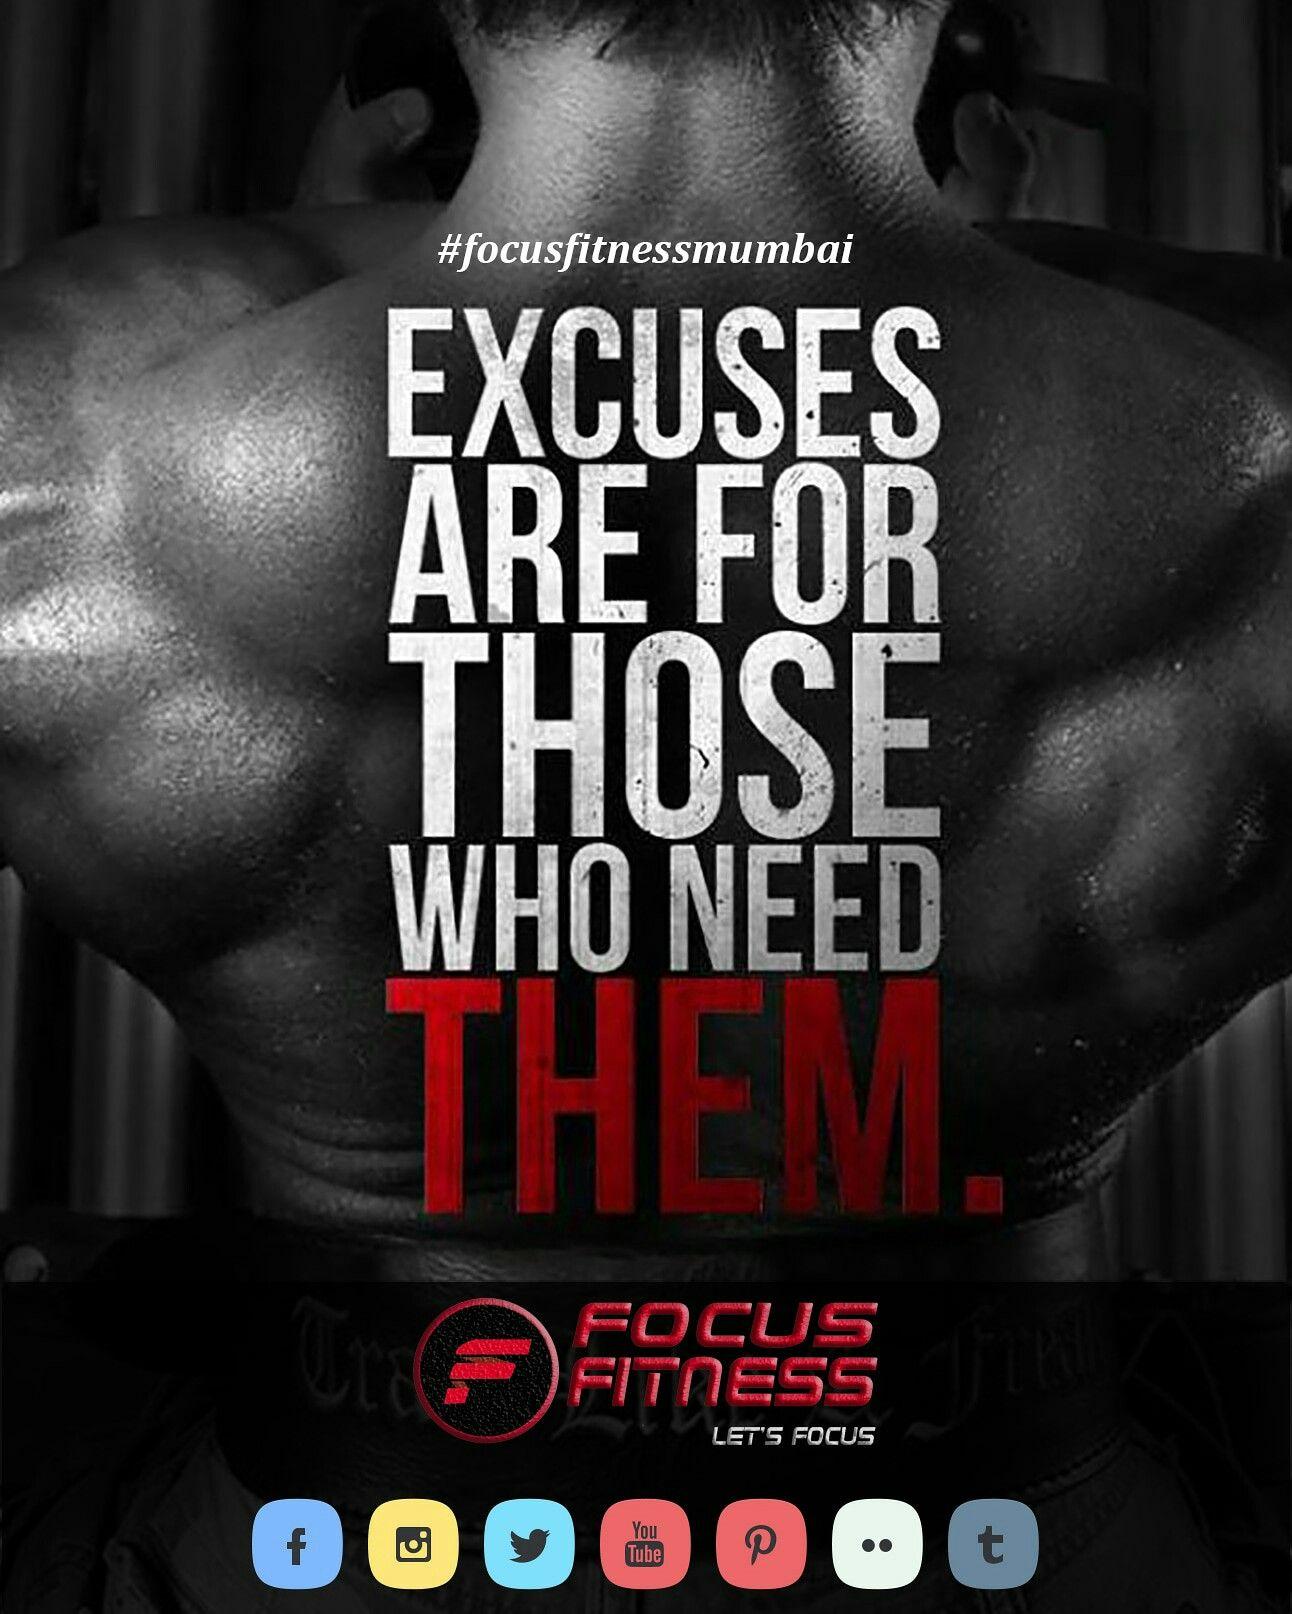 Pin By Jacked On Focusfitnessmumbai Bodybuilding Motivation Quotes Bodybuilding Motivation Gym Quote